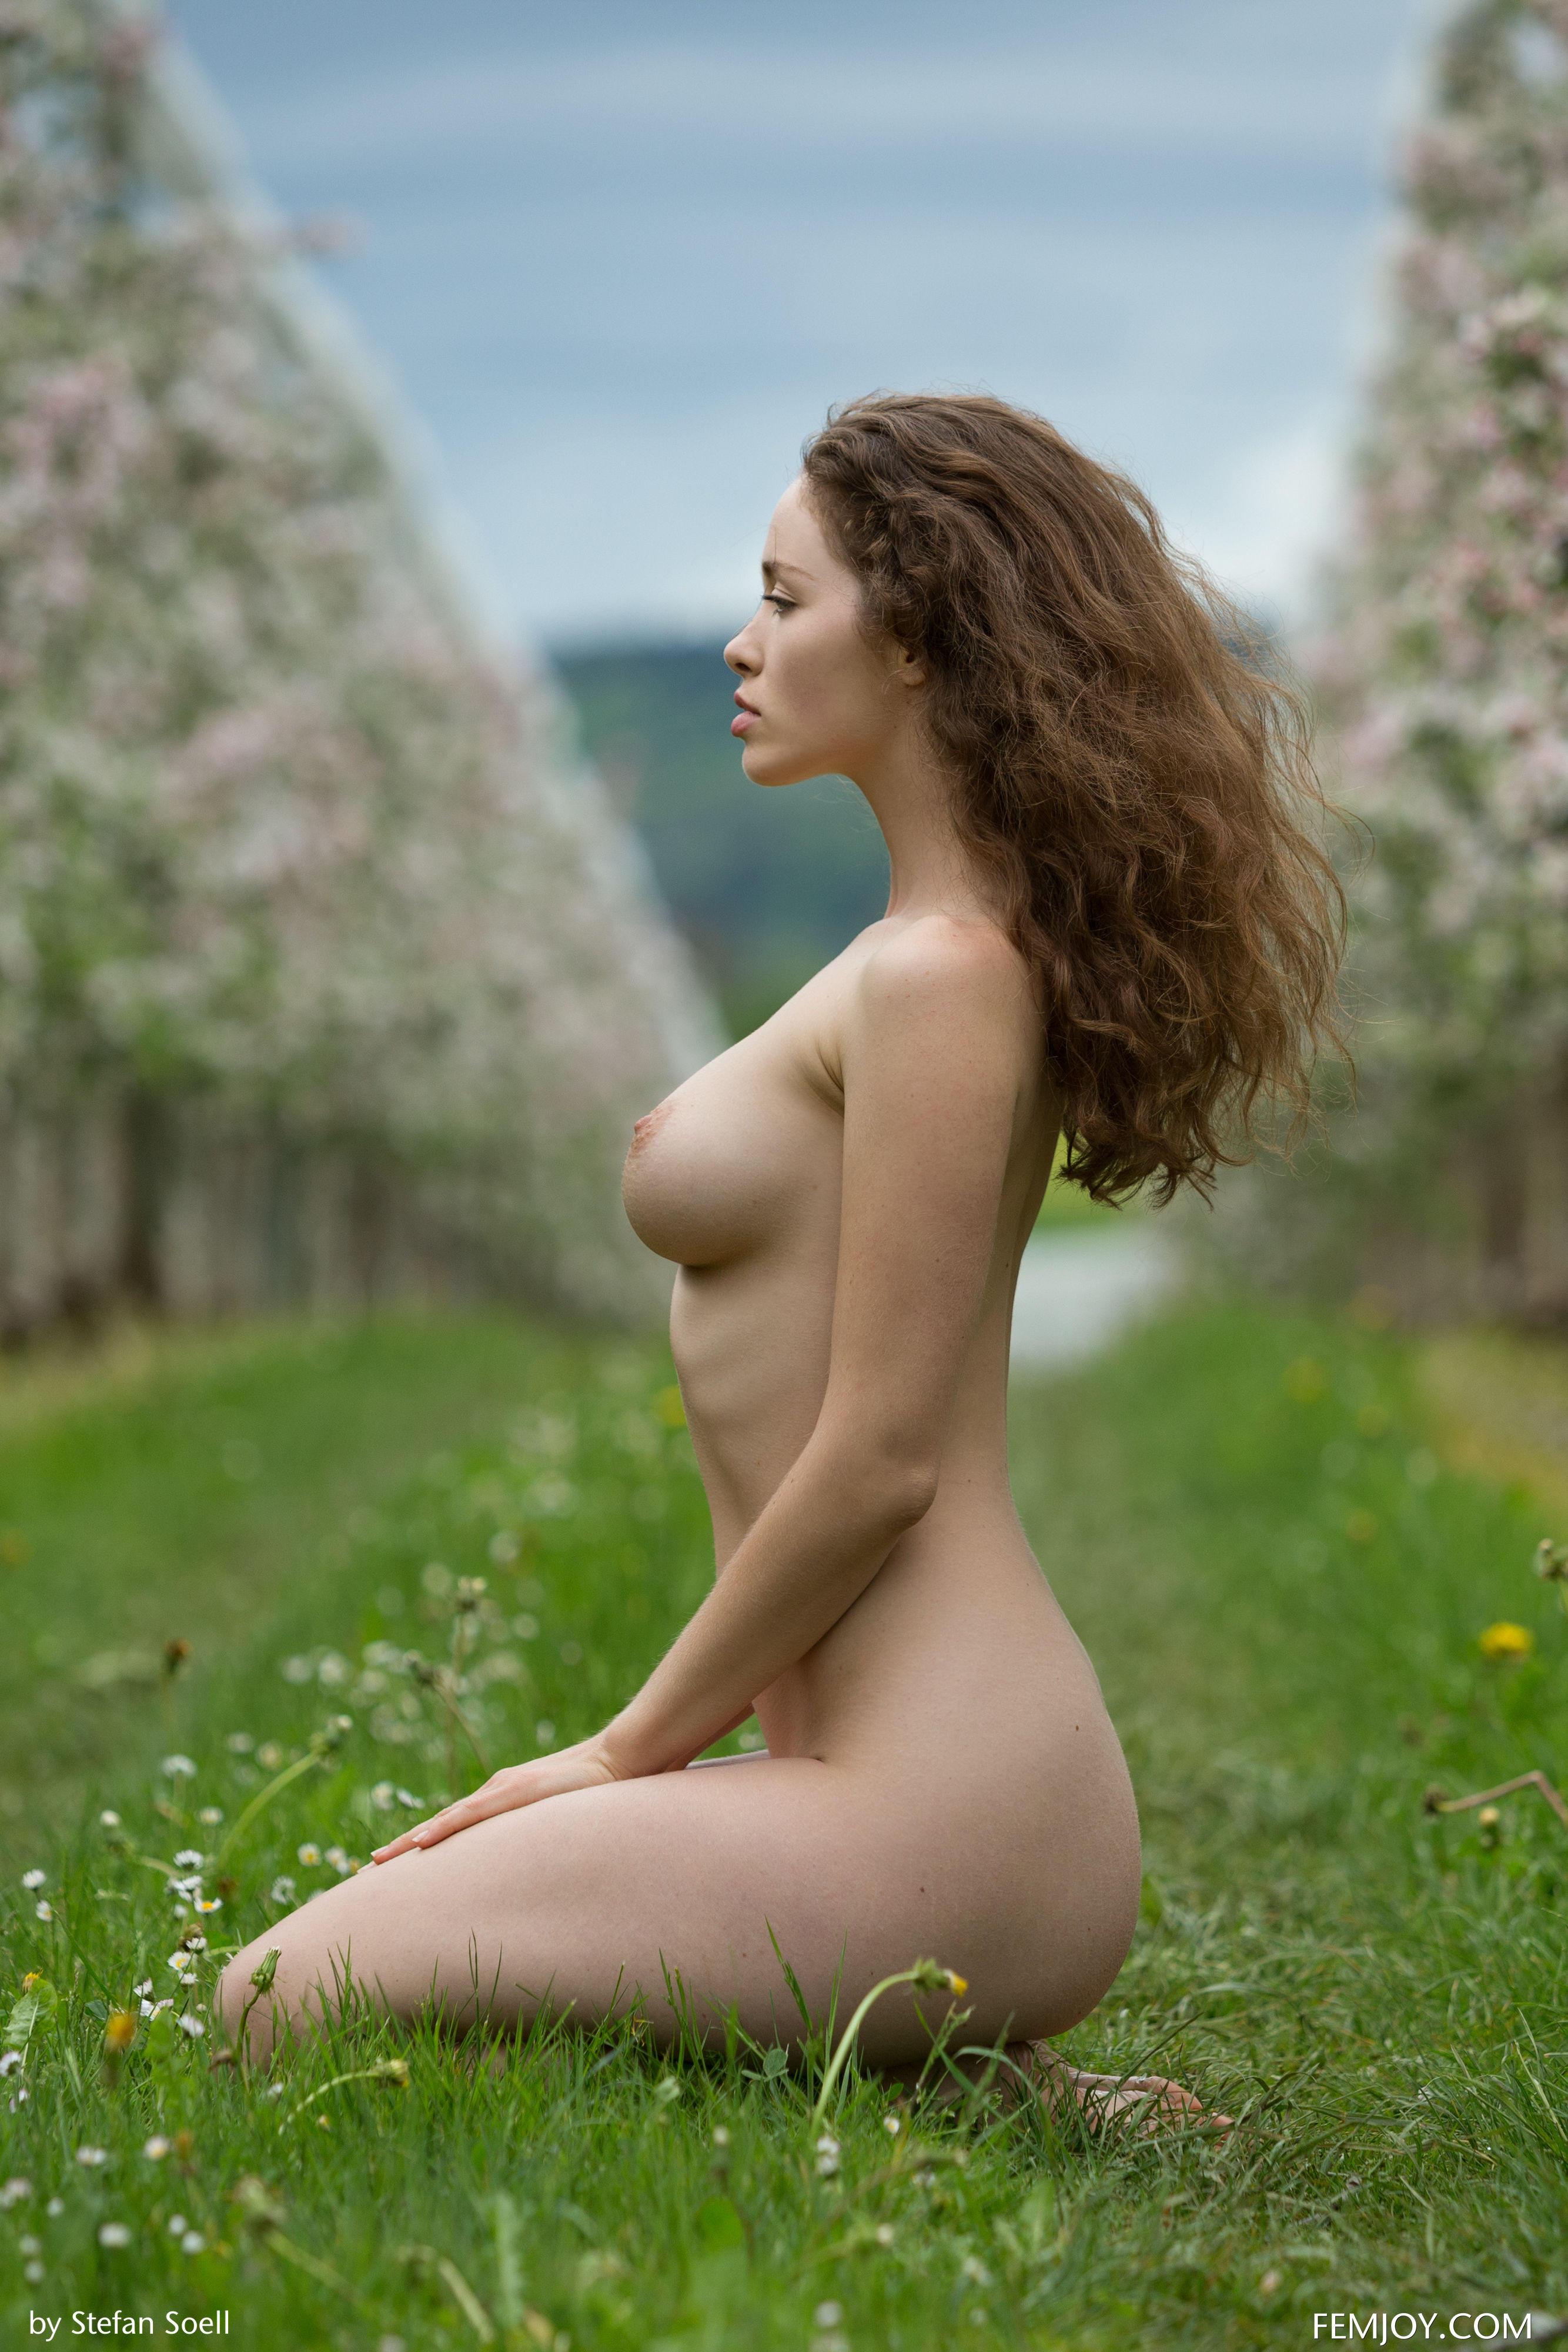 Sexy defloration beautiful nude thumbs